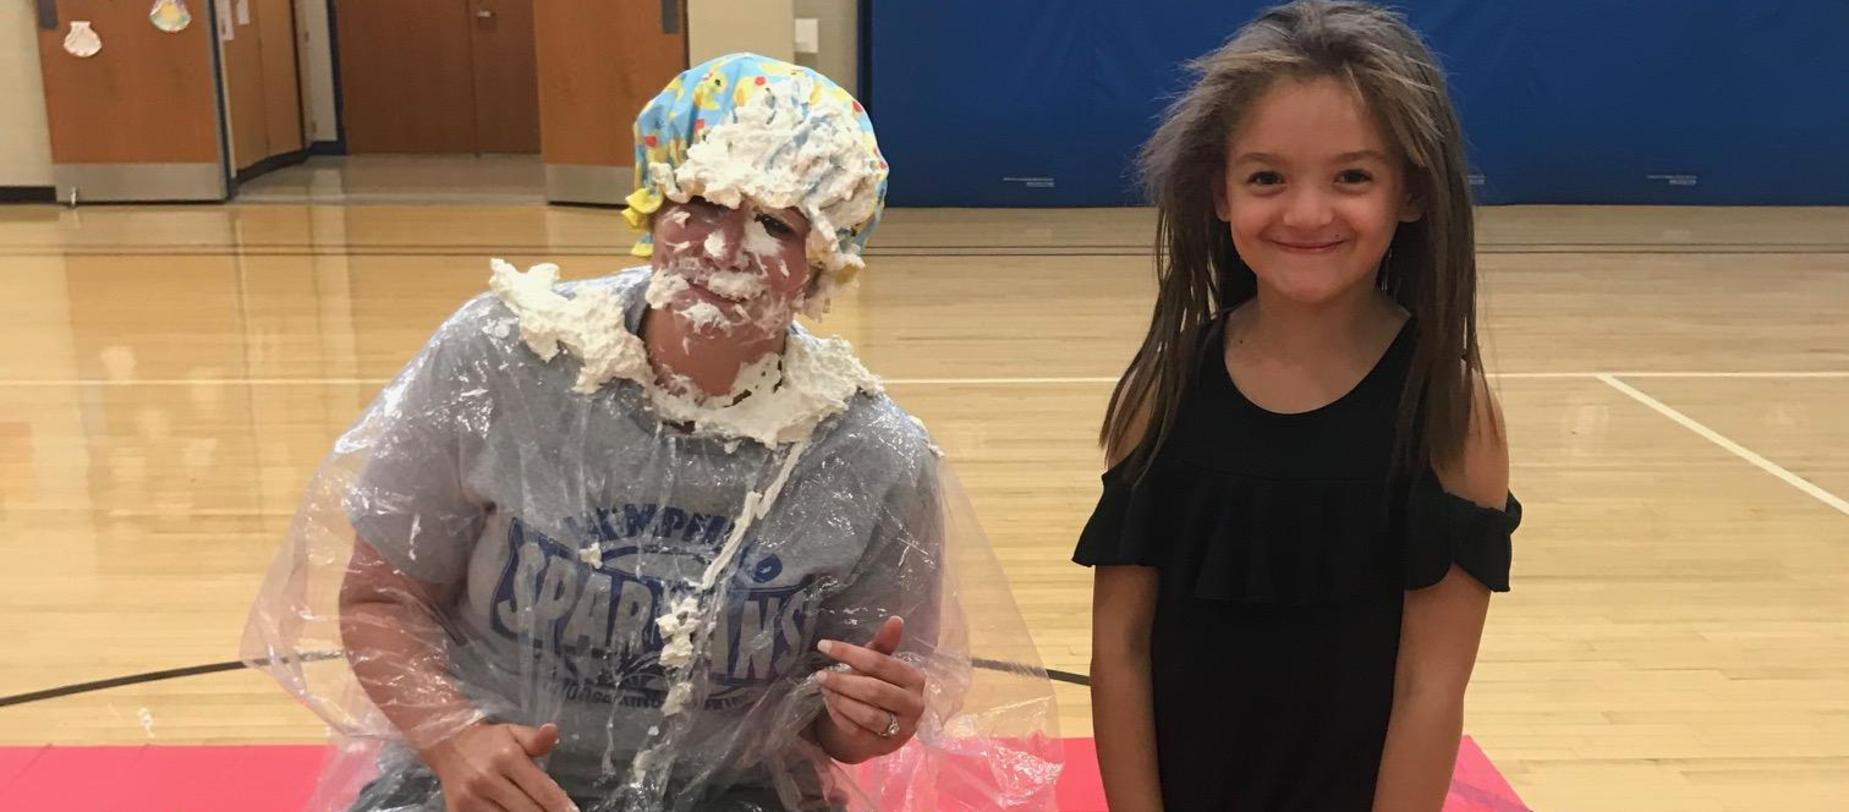 principal getting pie in face